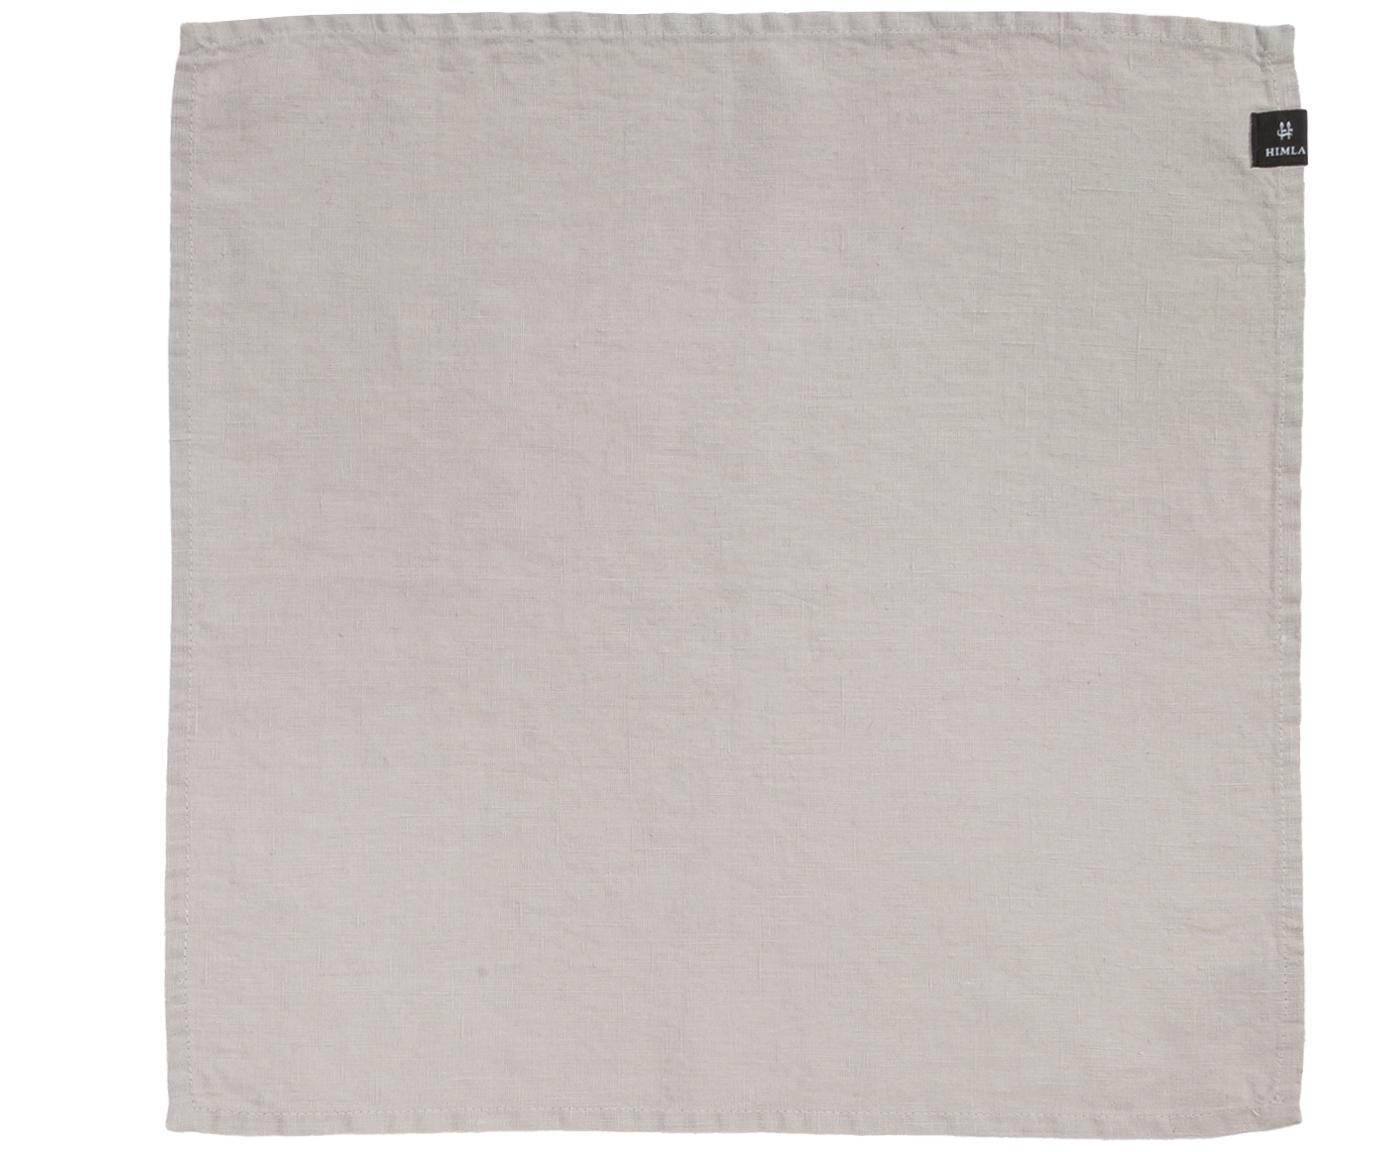 Leinen-Servietten Sunshine, 4 Stück, 50% Leinen, 50% Baumwolle, Aschweiss, 45 x 45 cm